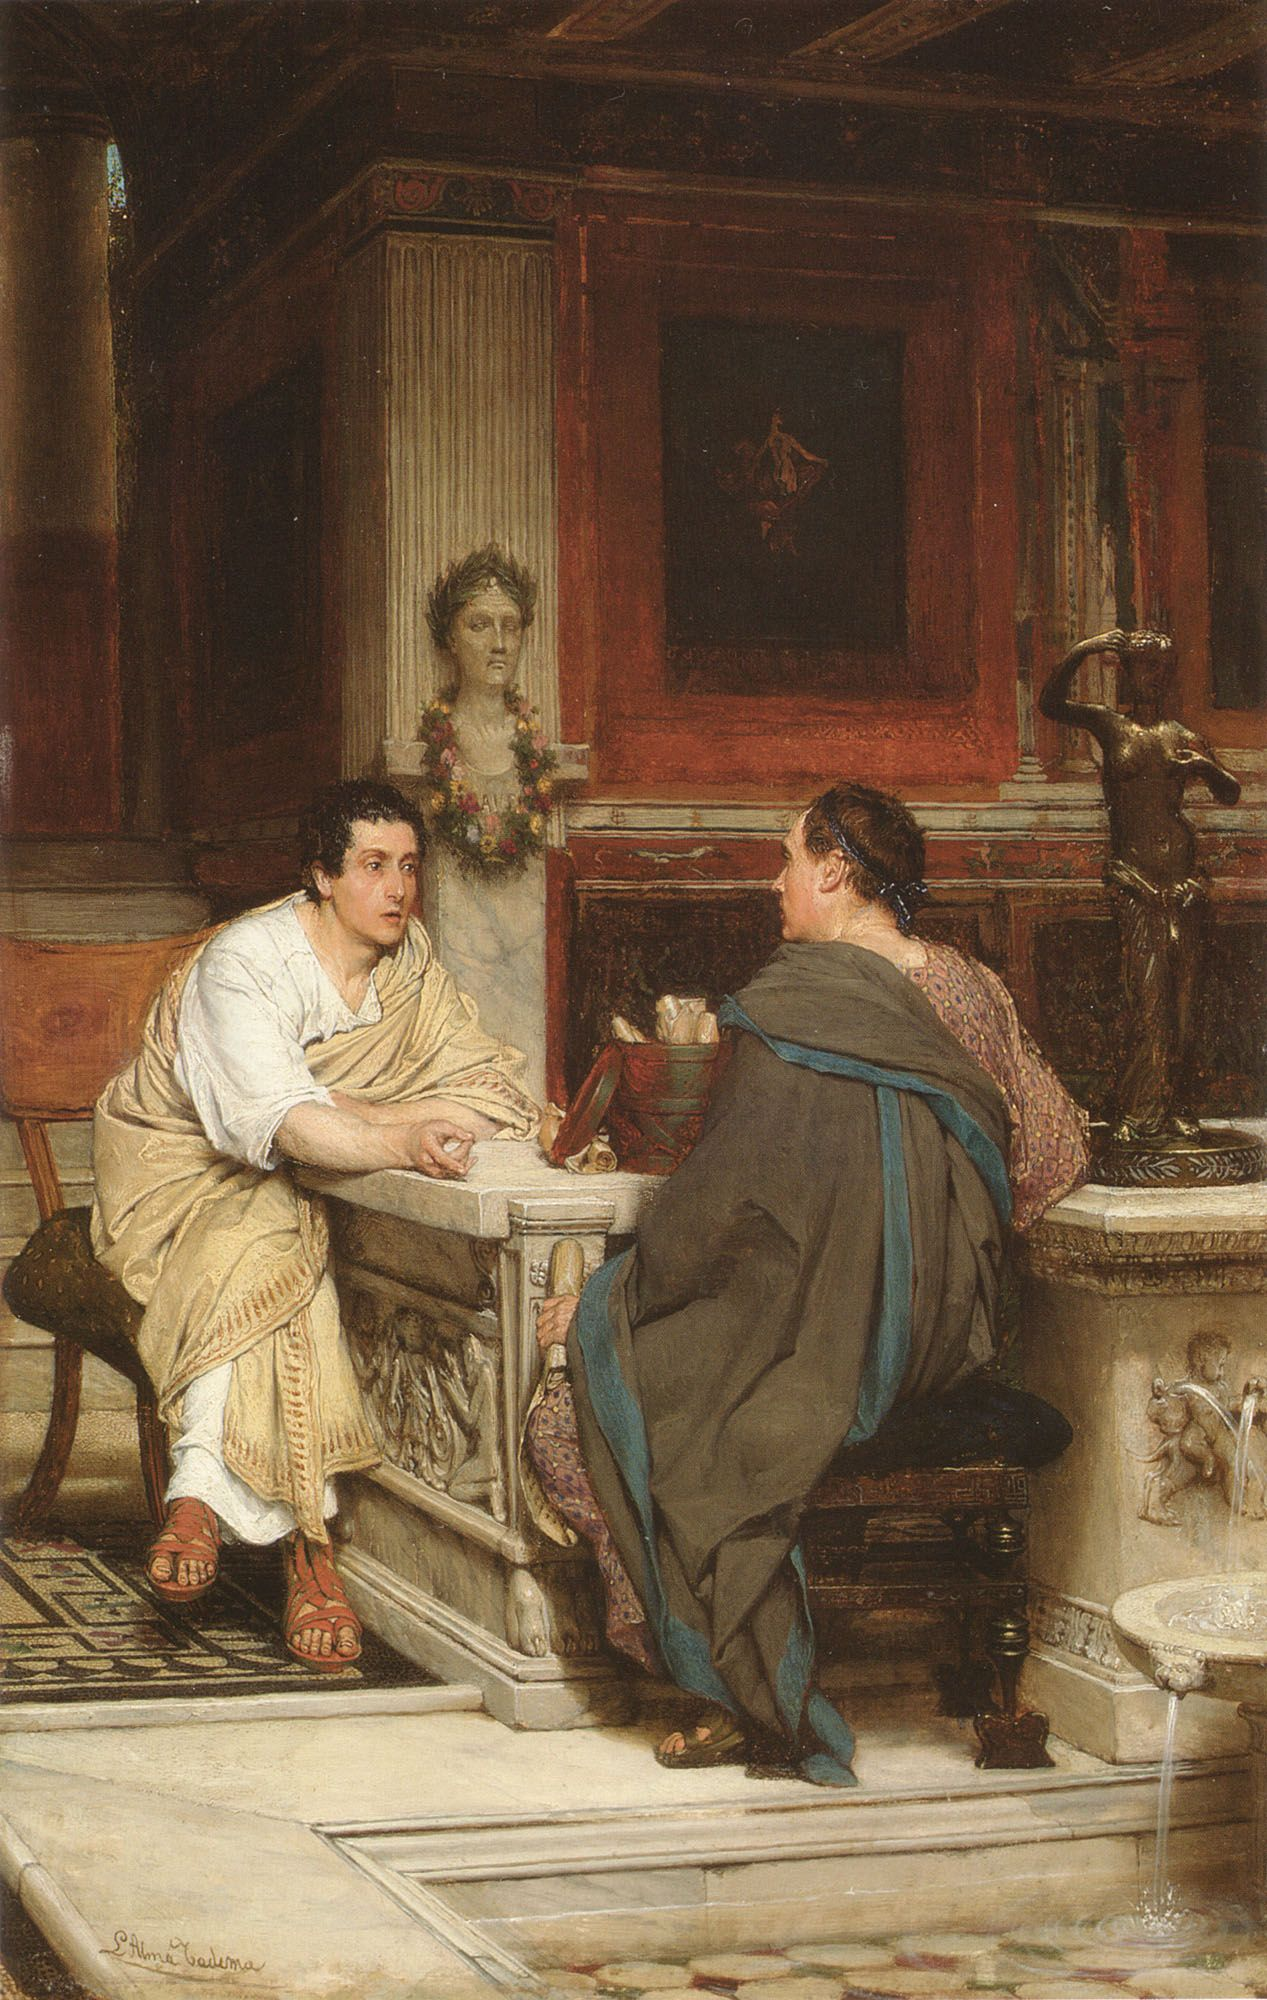 ������� <������> :: �����-������ ��� ������� - Lourens Alma Tadema (�����-������) ����